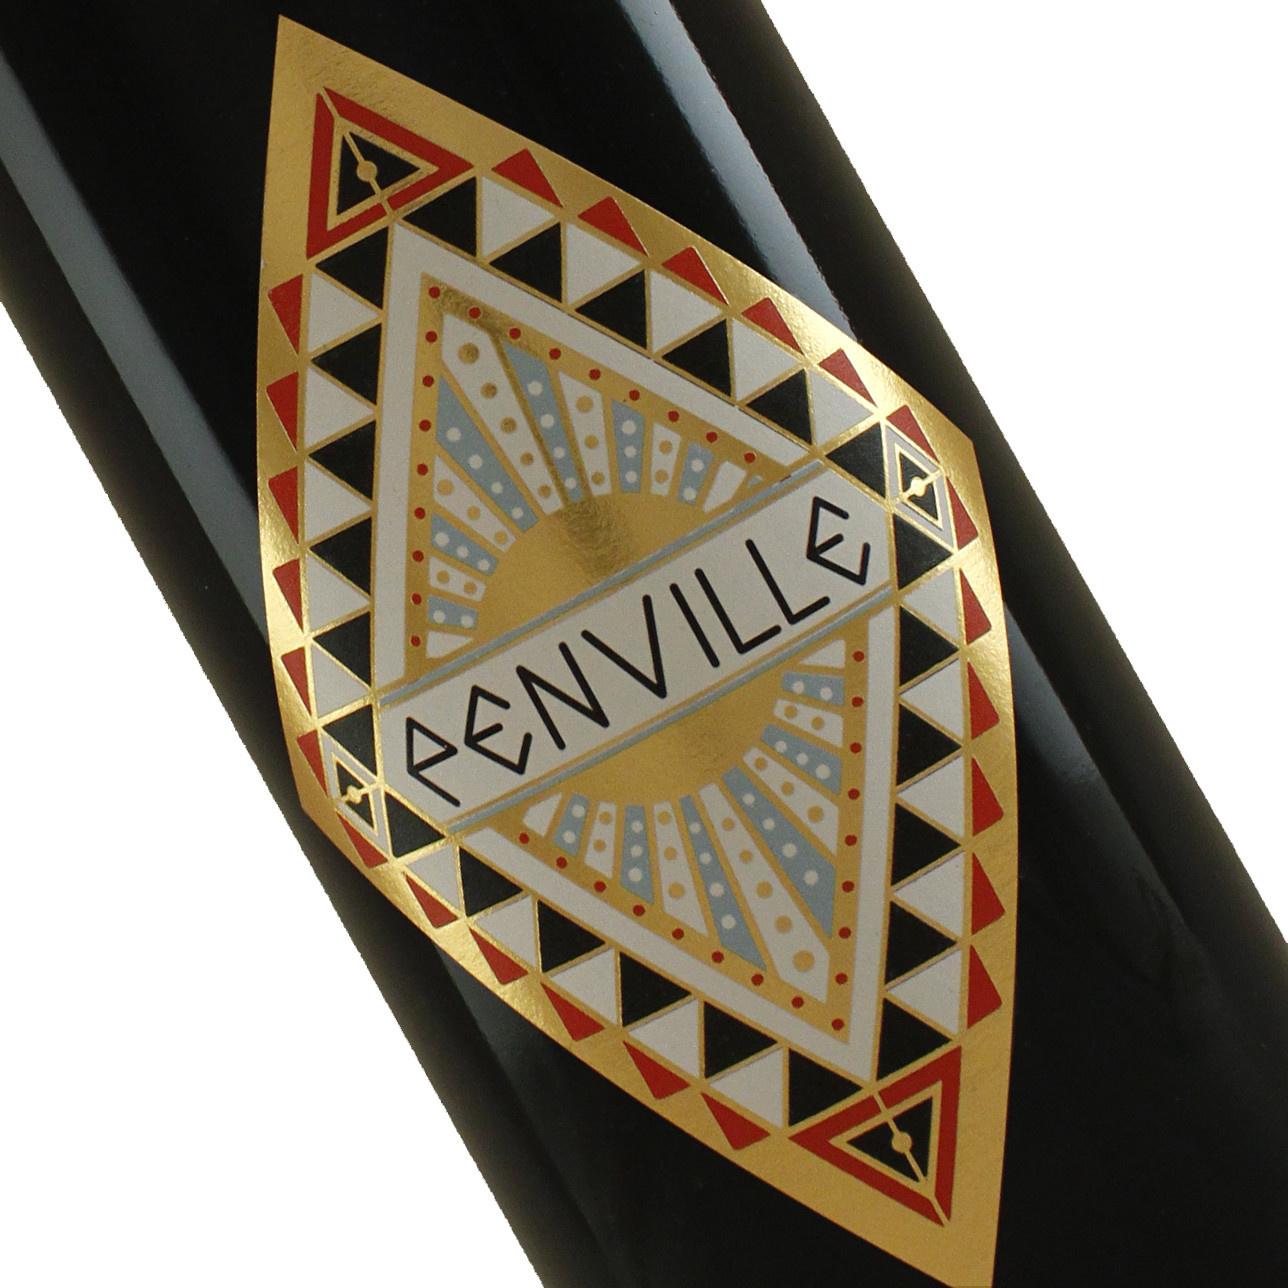 Penville 2016 Syrah Stolpman Vineyard, Santa Ynez Valley